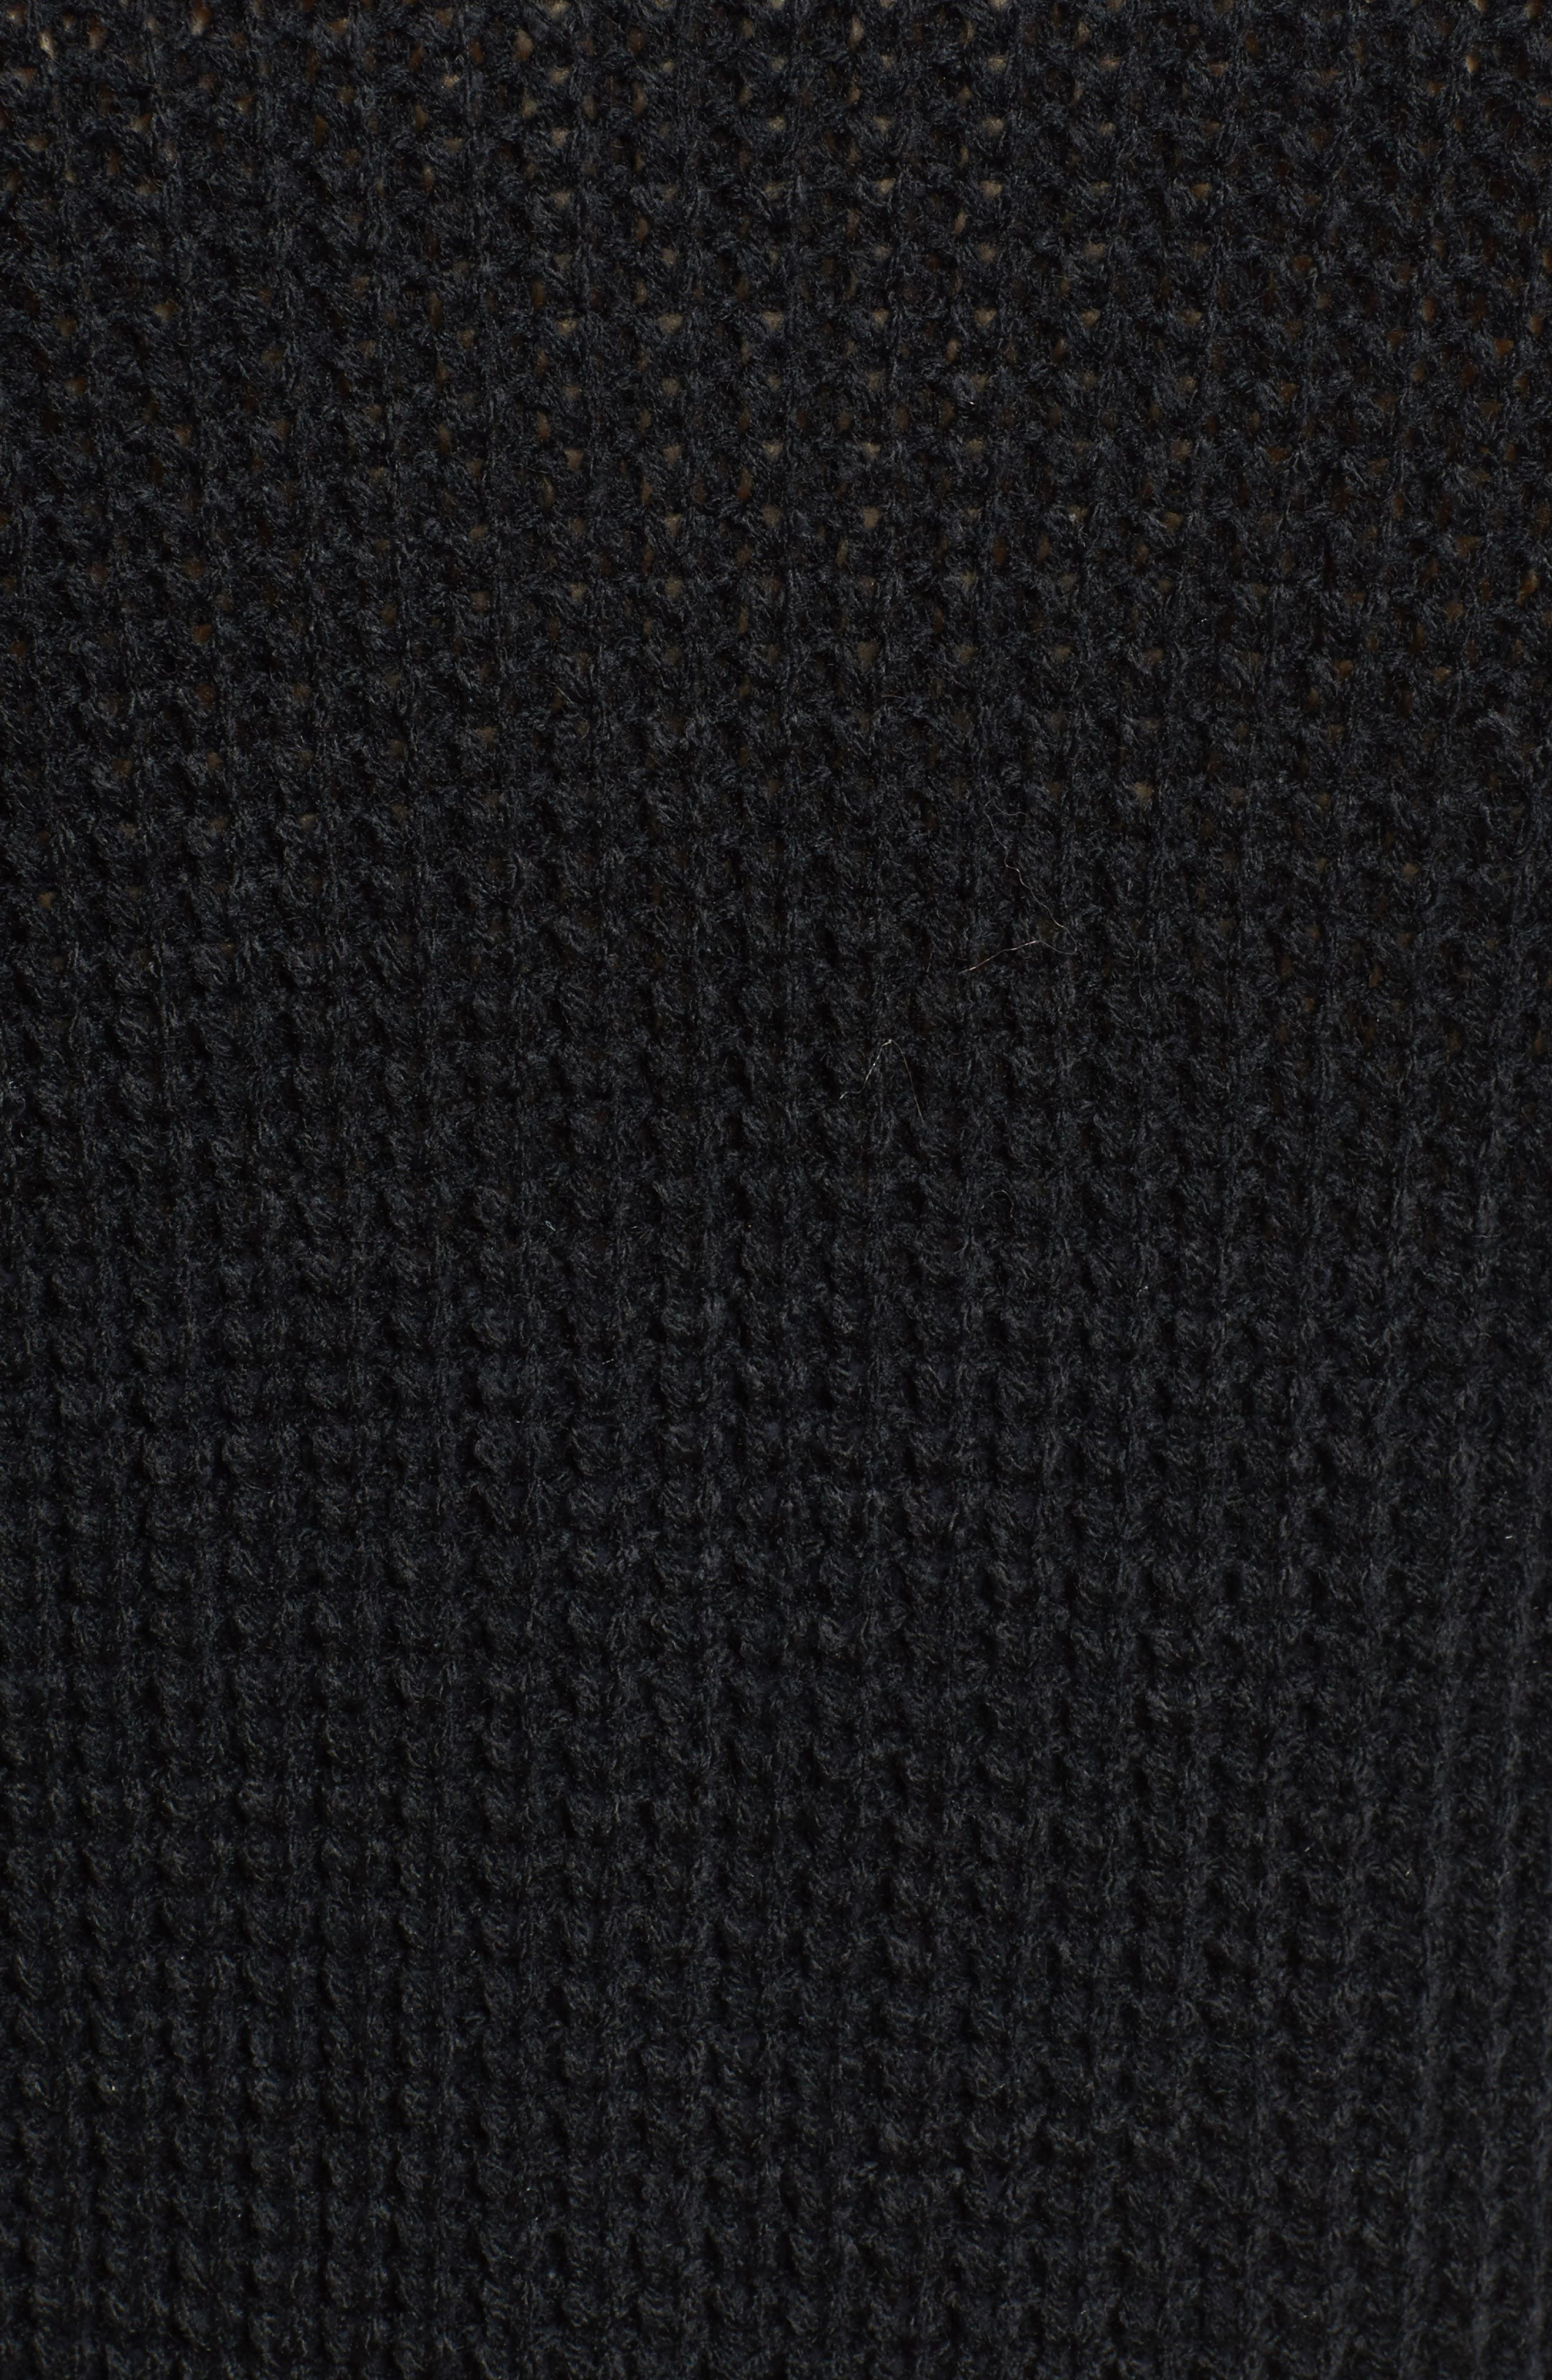 Faux Pearl Detail Cardigan,                             Alternate thumbnail 5, color,                             Black